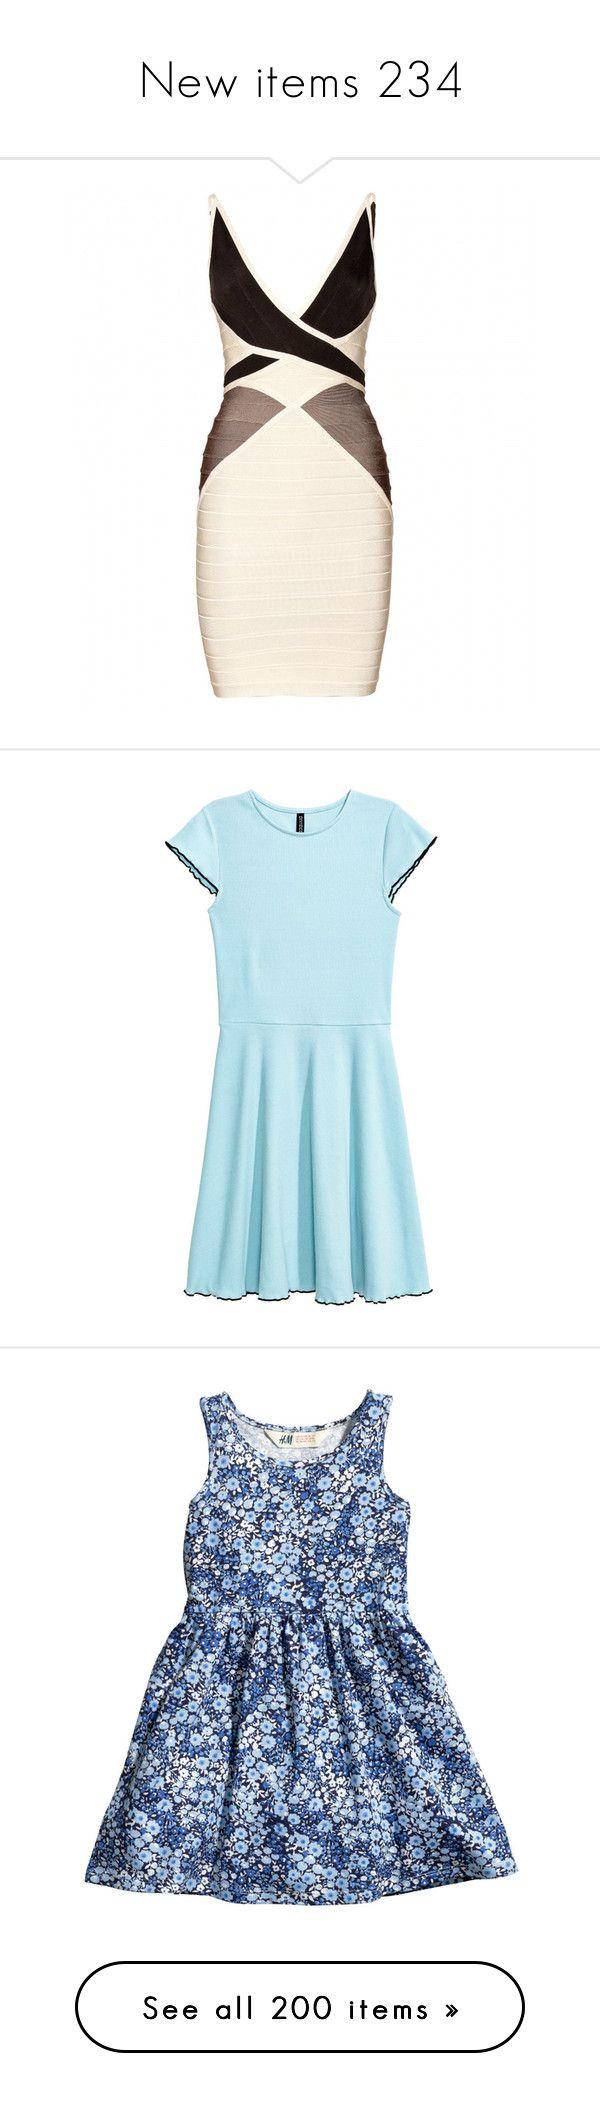 """New items 234"" by cavallaro ❤ liked on Polyvore featuring dresses, vestidos, short dresses, vestiti, mini bandage dress, rayon dress, v neck mini dress, colorblock dress, stretch dress and tight blue dress"